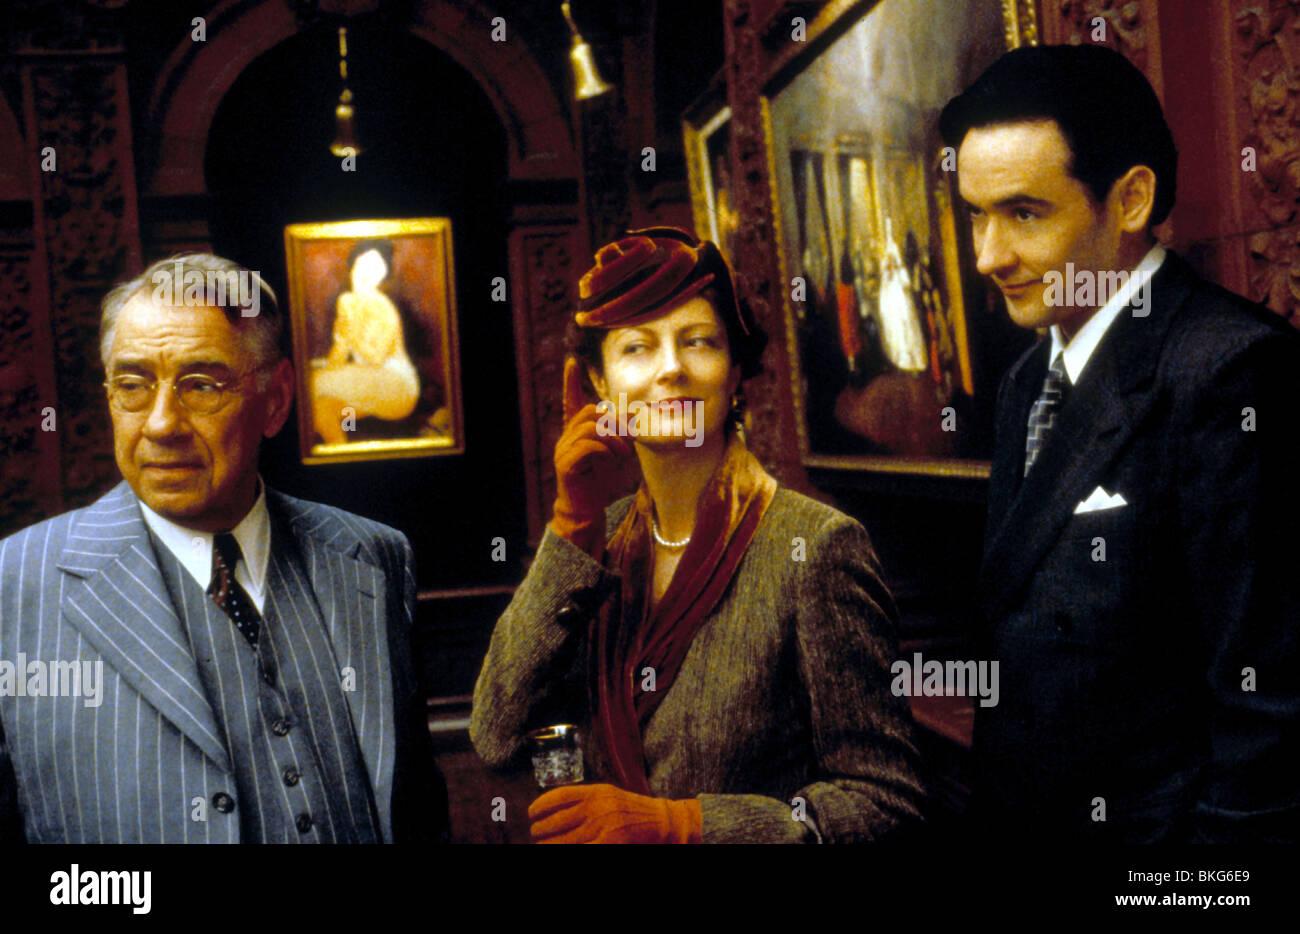 CRADLE WILL ROCK (1999) PHILIP BAKER HALL, SUSAN SARANDON, JOHN CUSACK CRDW 032 - Stock Image